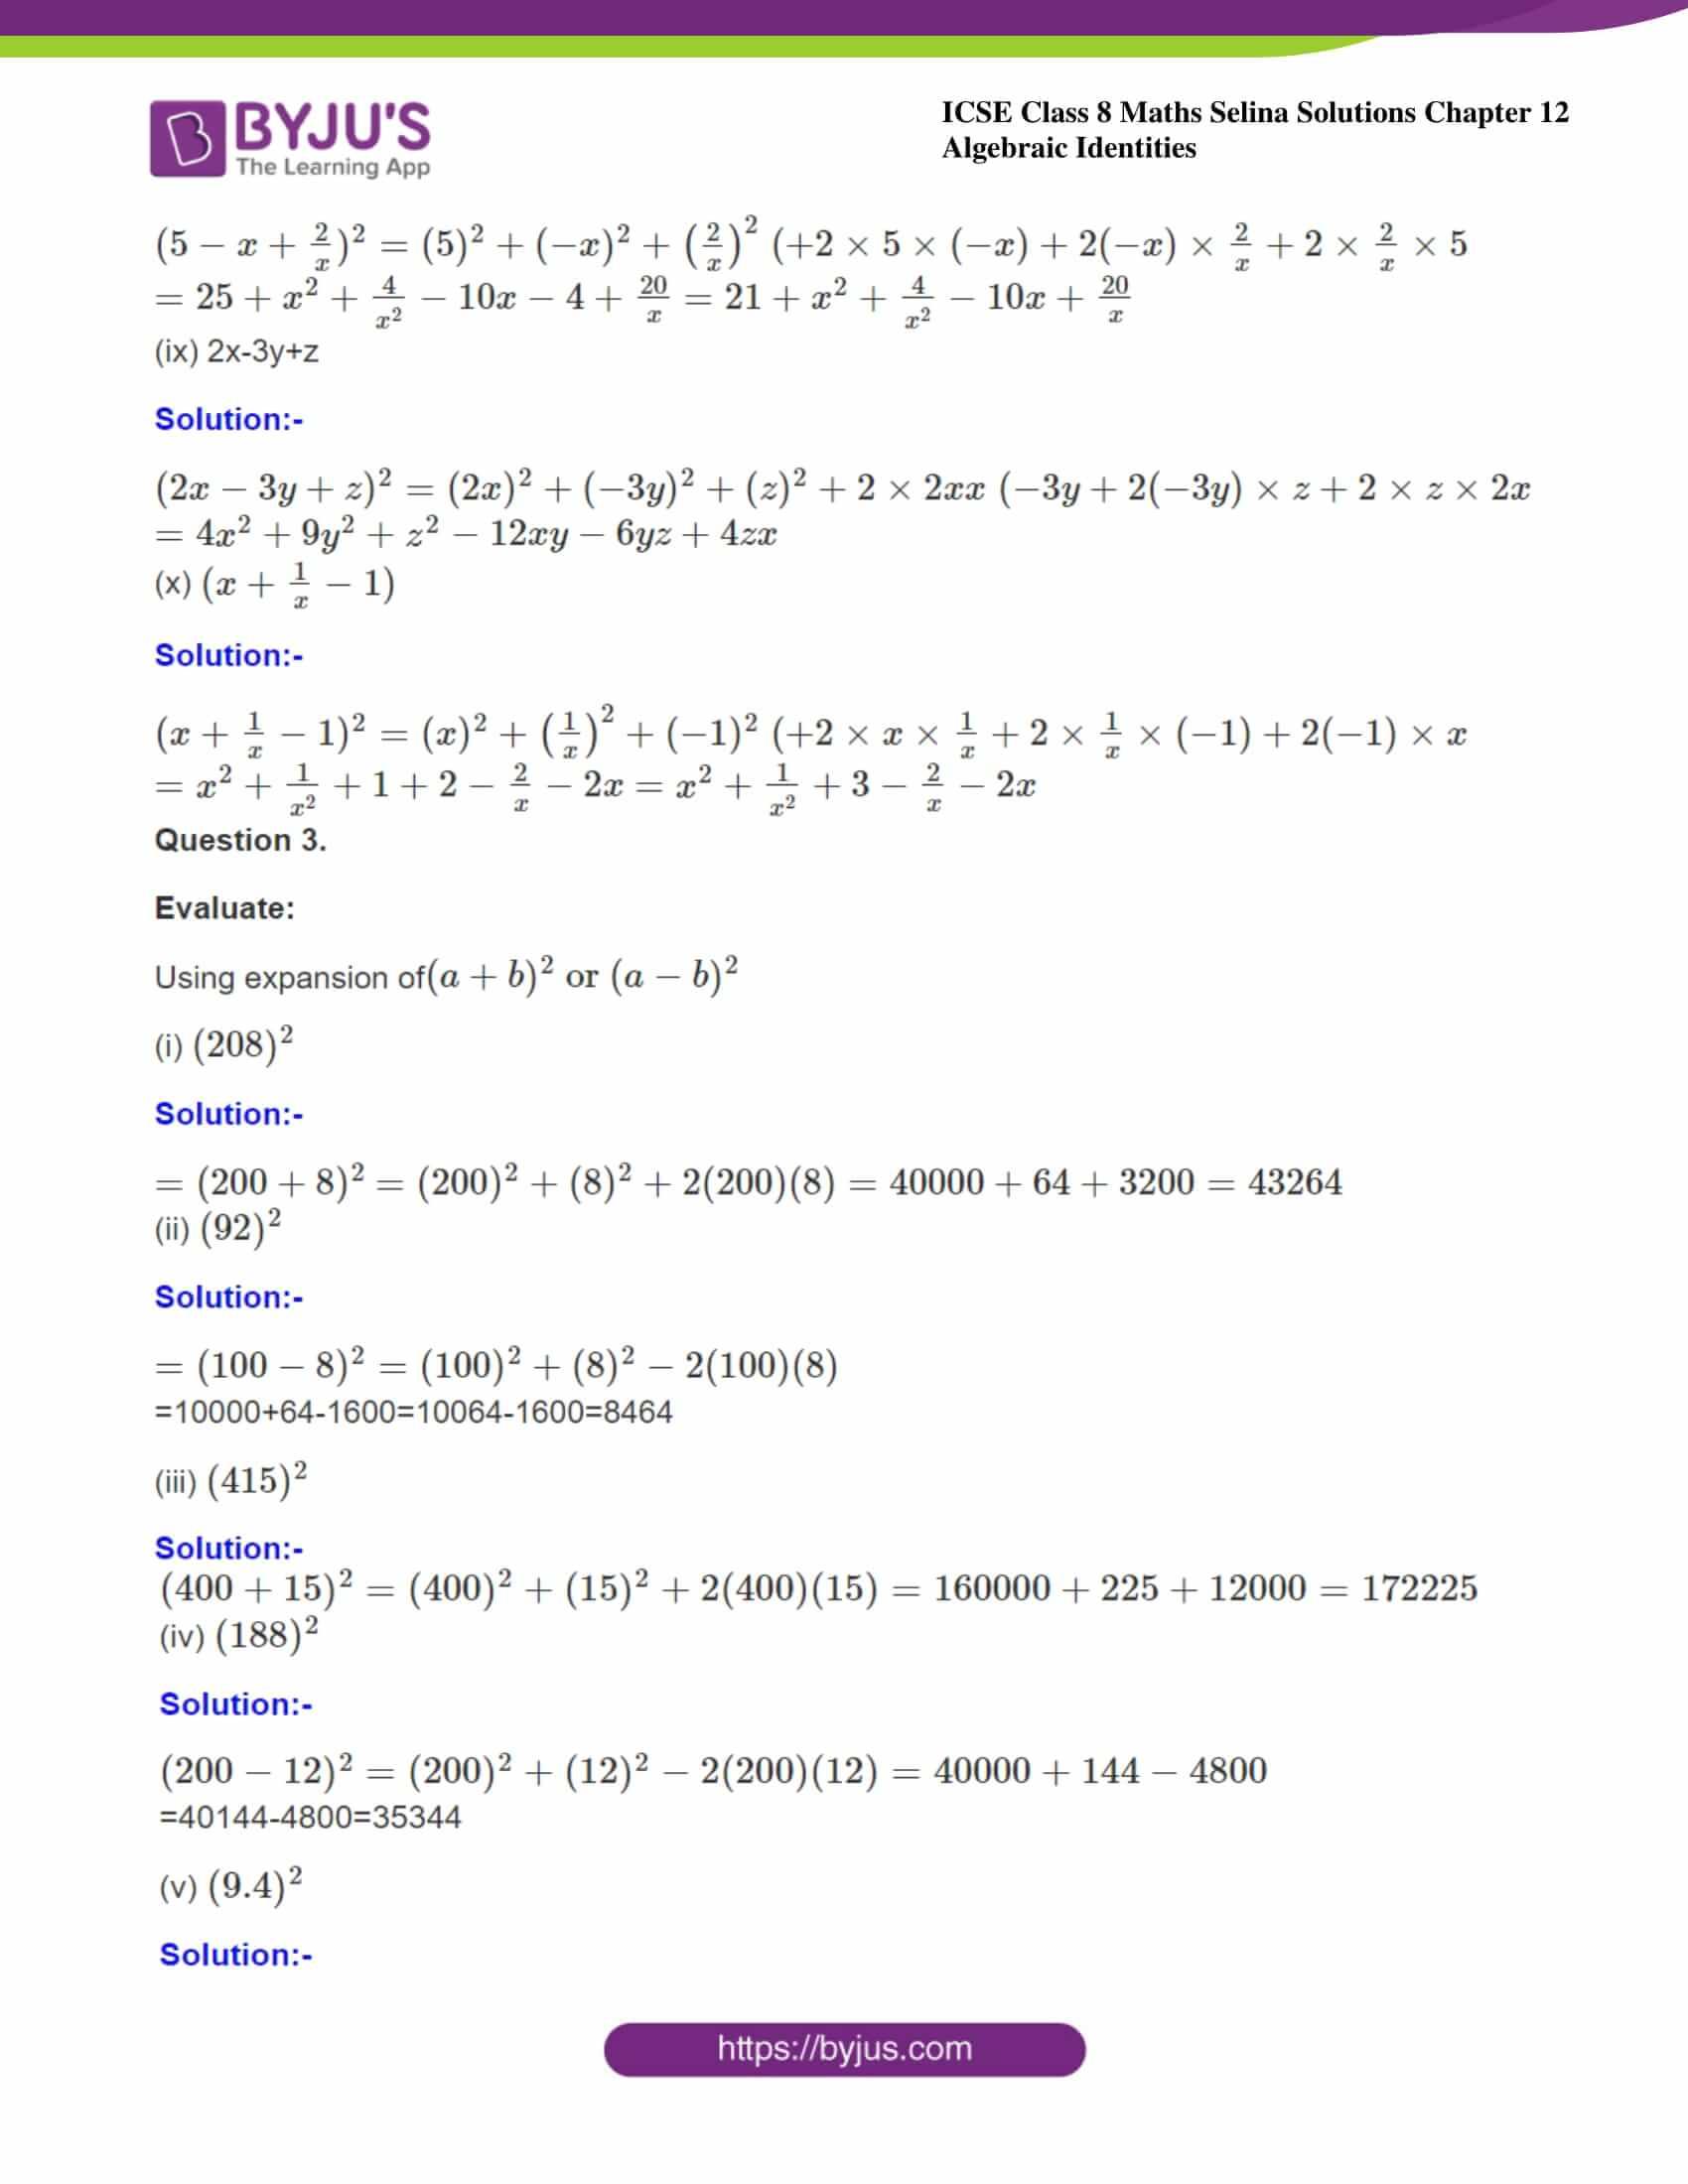 icse class 8 maths may3 selina solutions chapter 12 algebraic identities 08